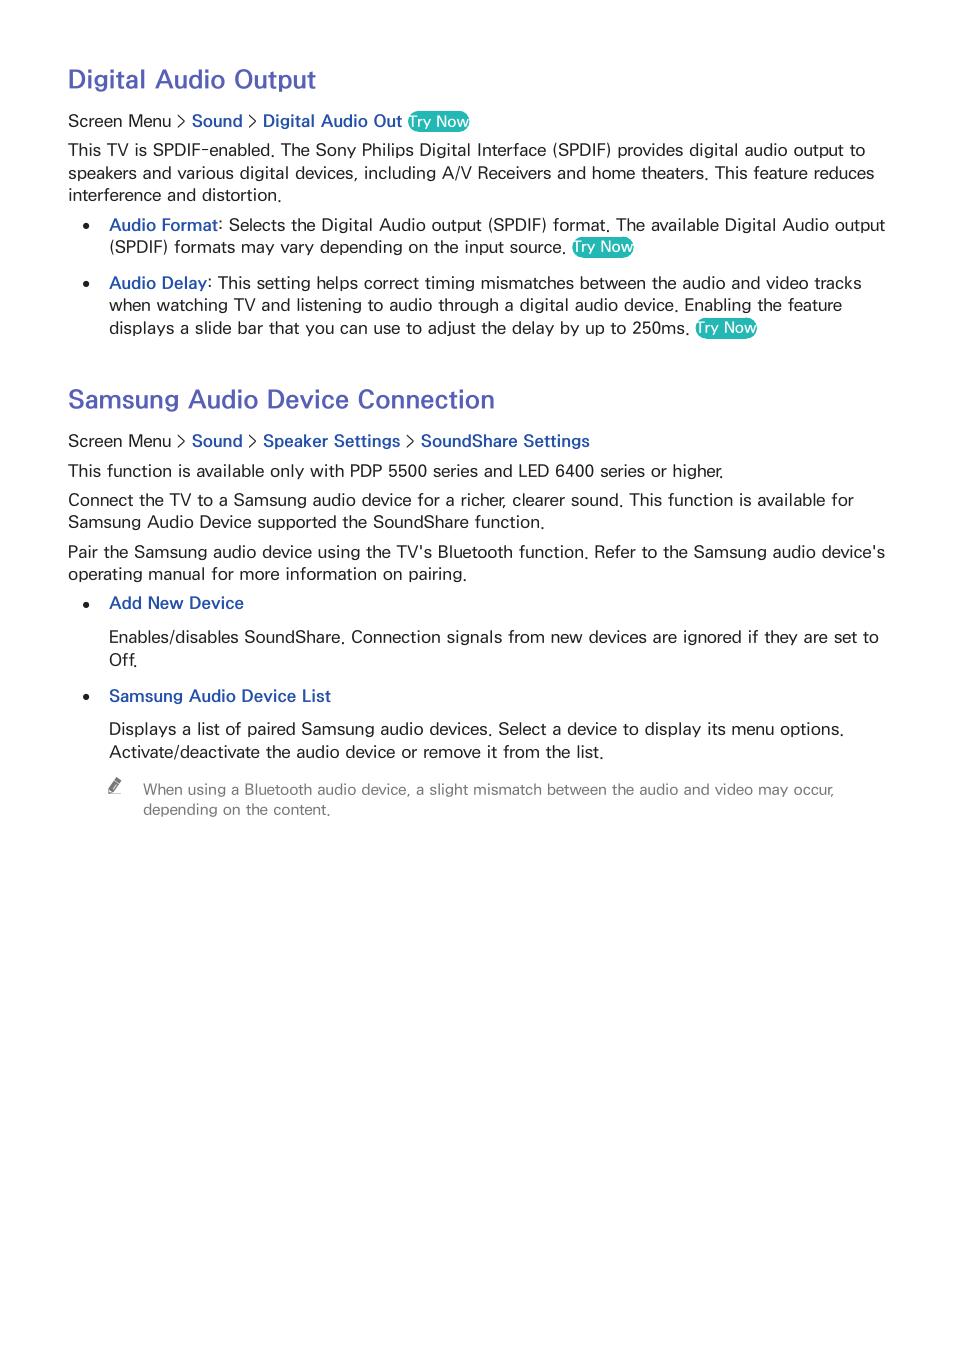 88 digital audio output, 88 samsung audio device connection